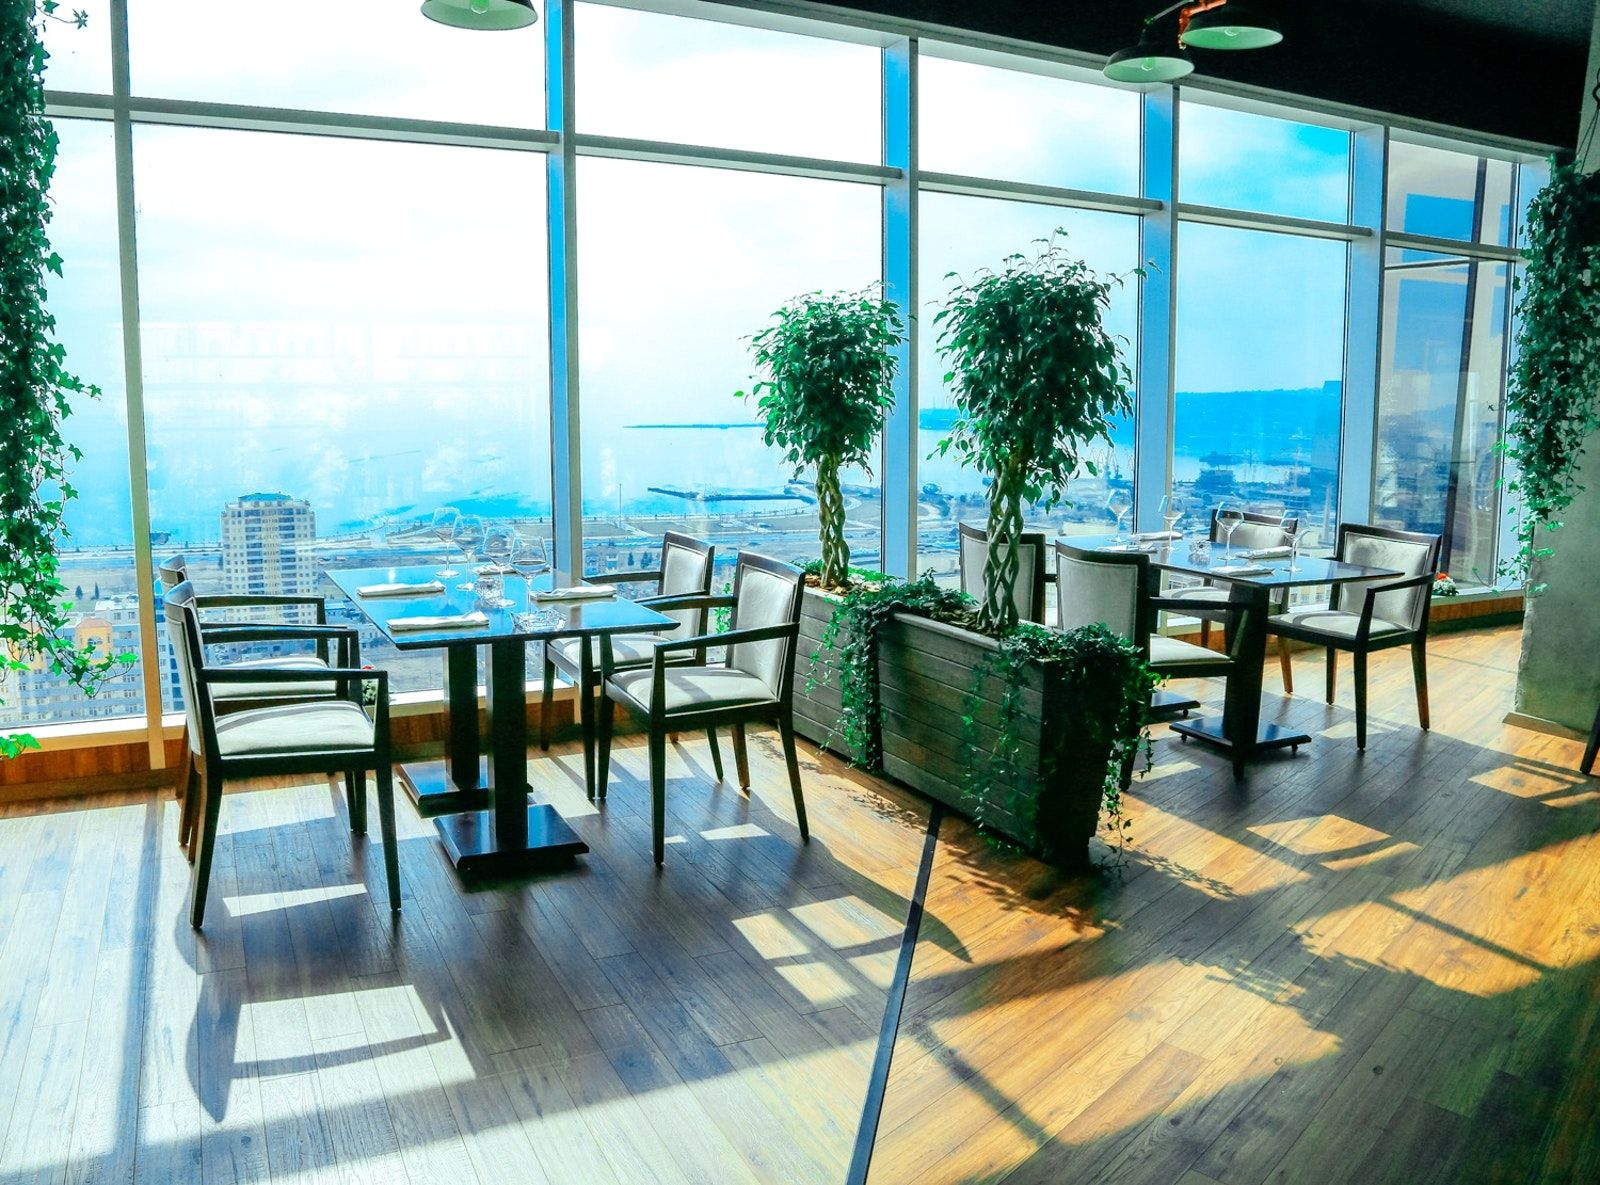 Restaurants In Baku With The Best City View City View Best Cities Baku Restaurant